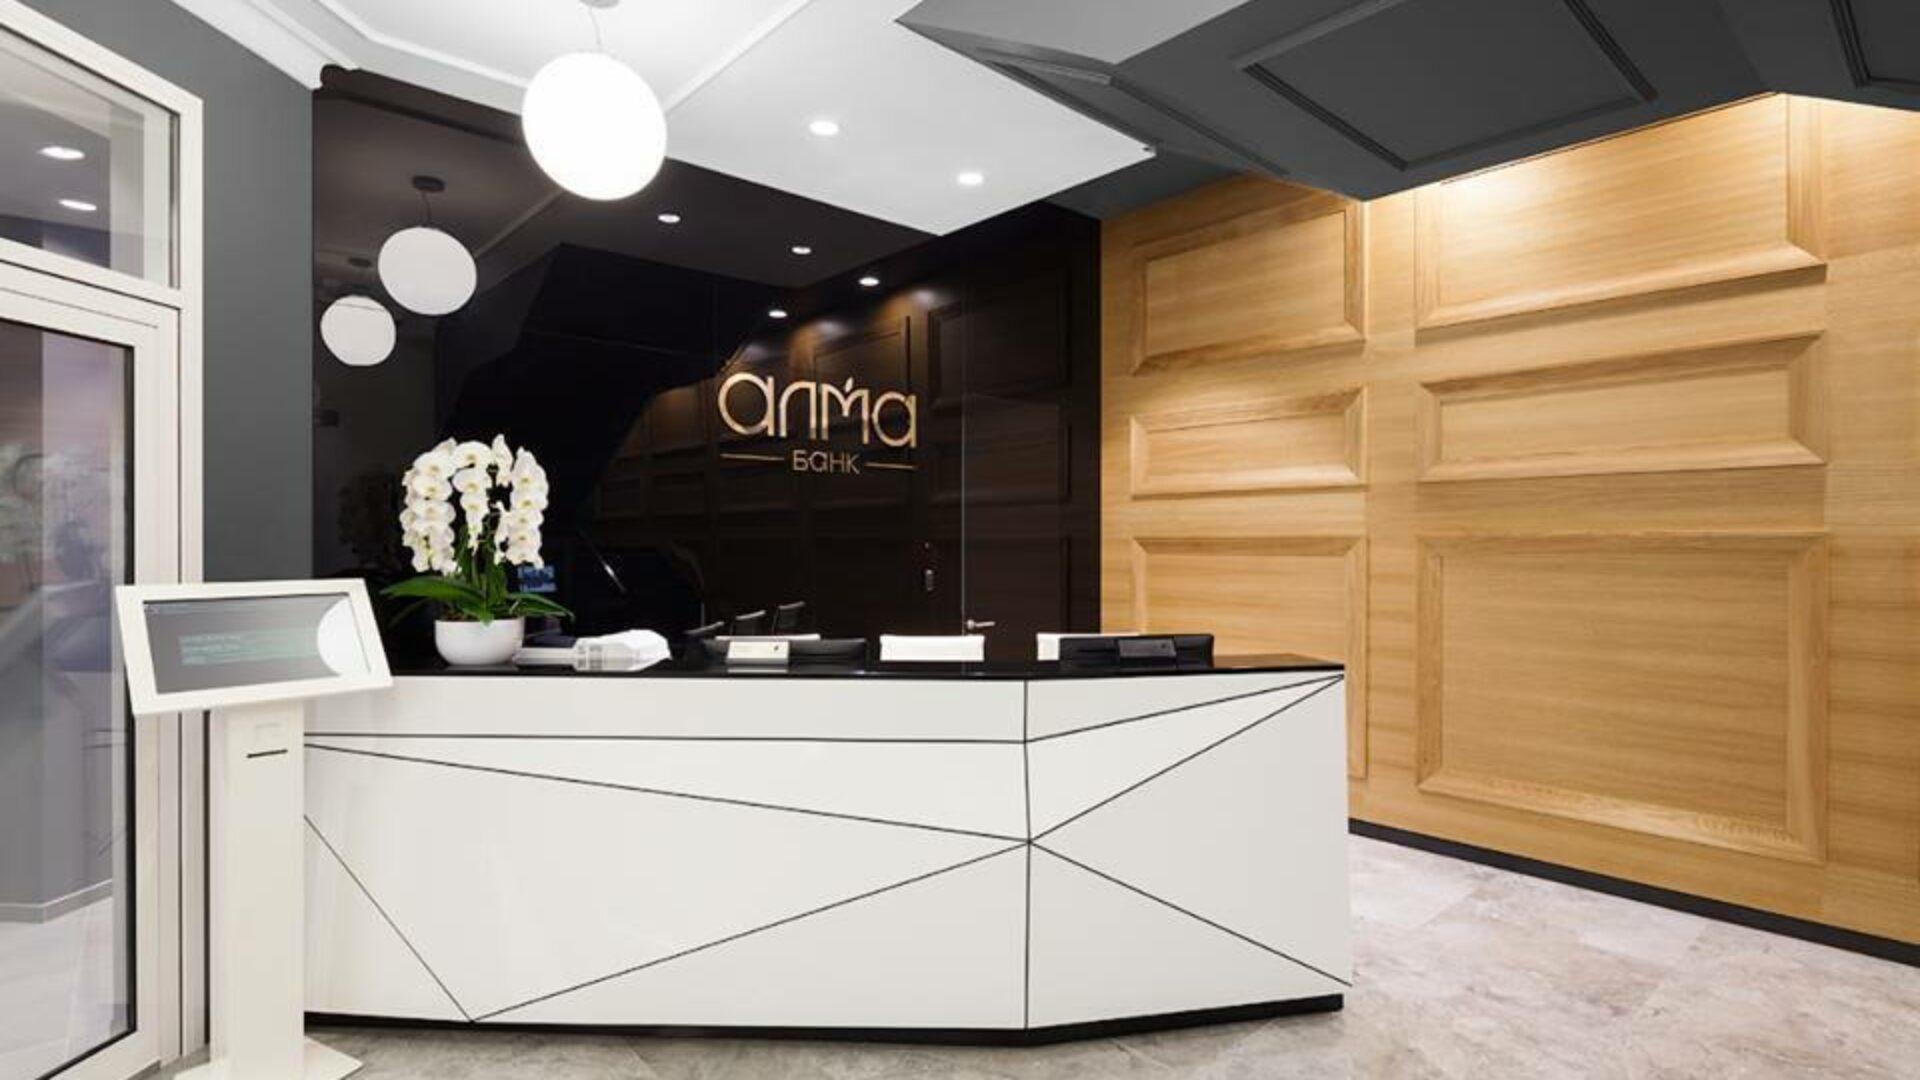 alma-bank-merkuriy-05